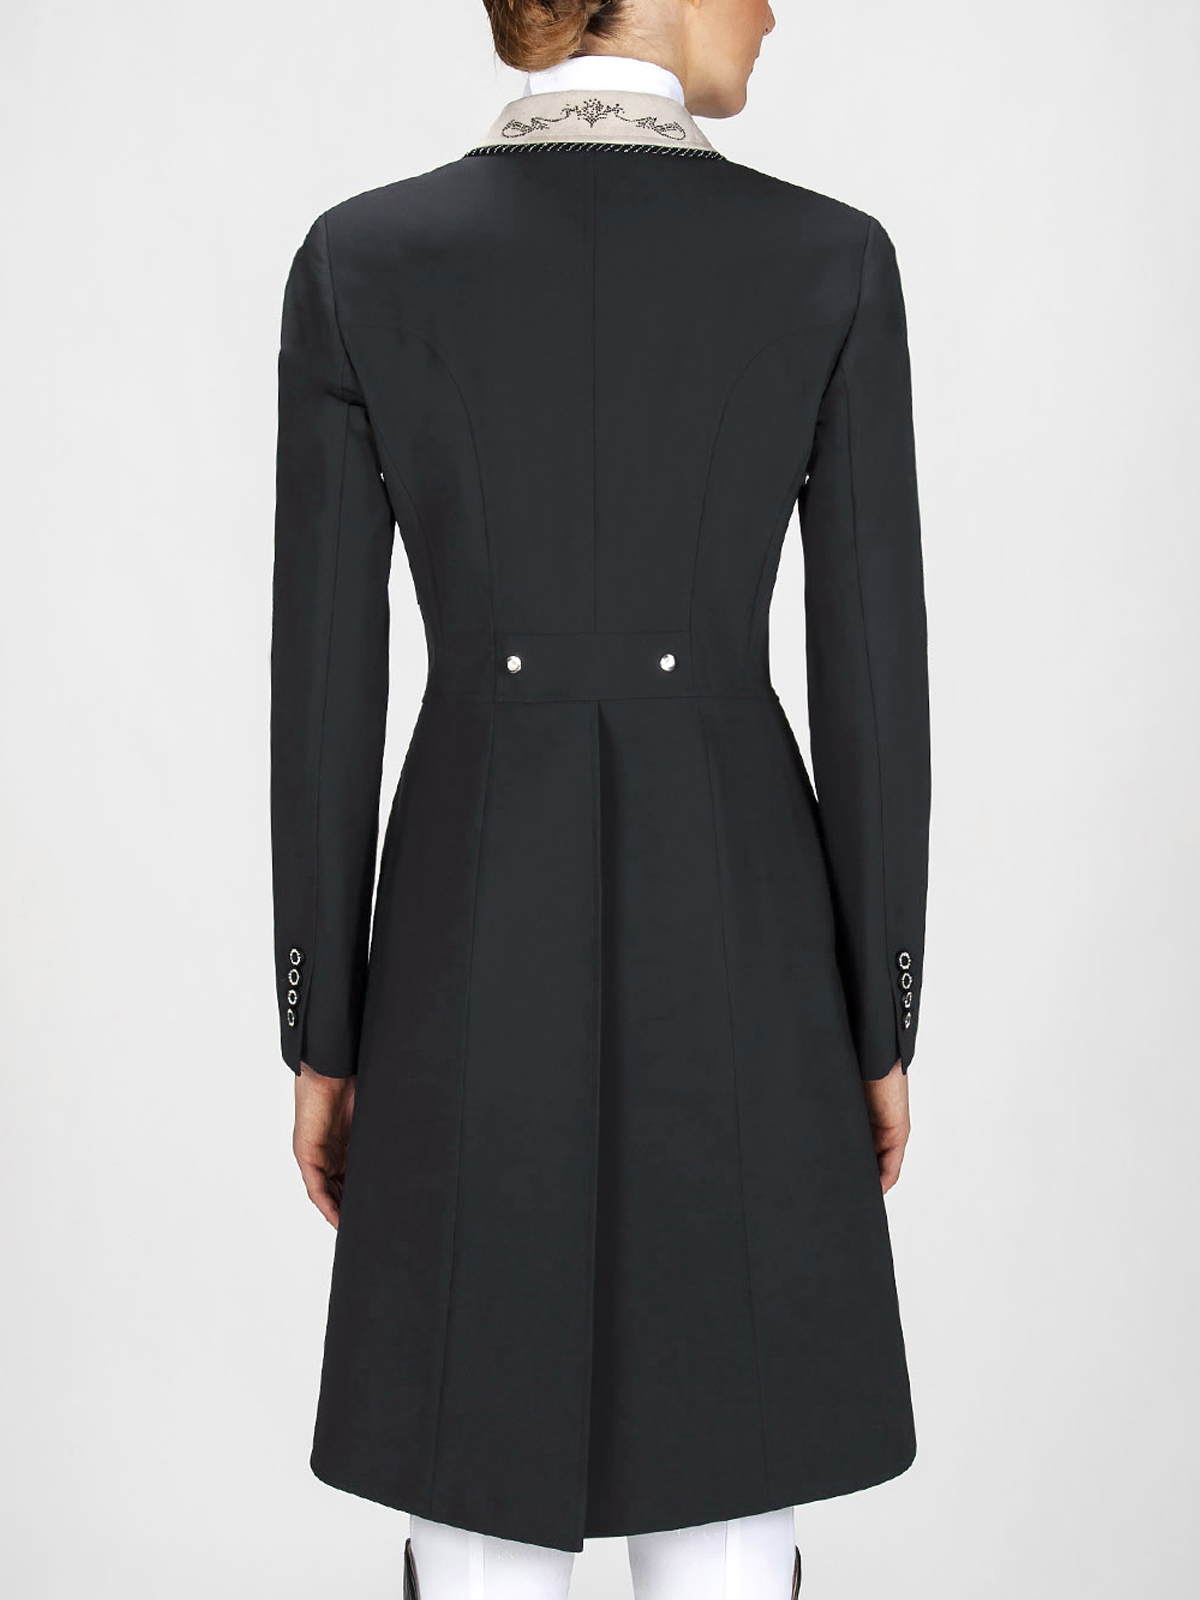 CADENCE - Women's Dressage Tailcoat X Cool Evo 1